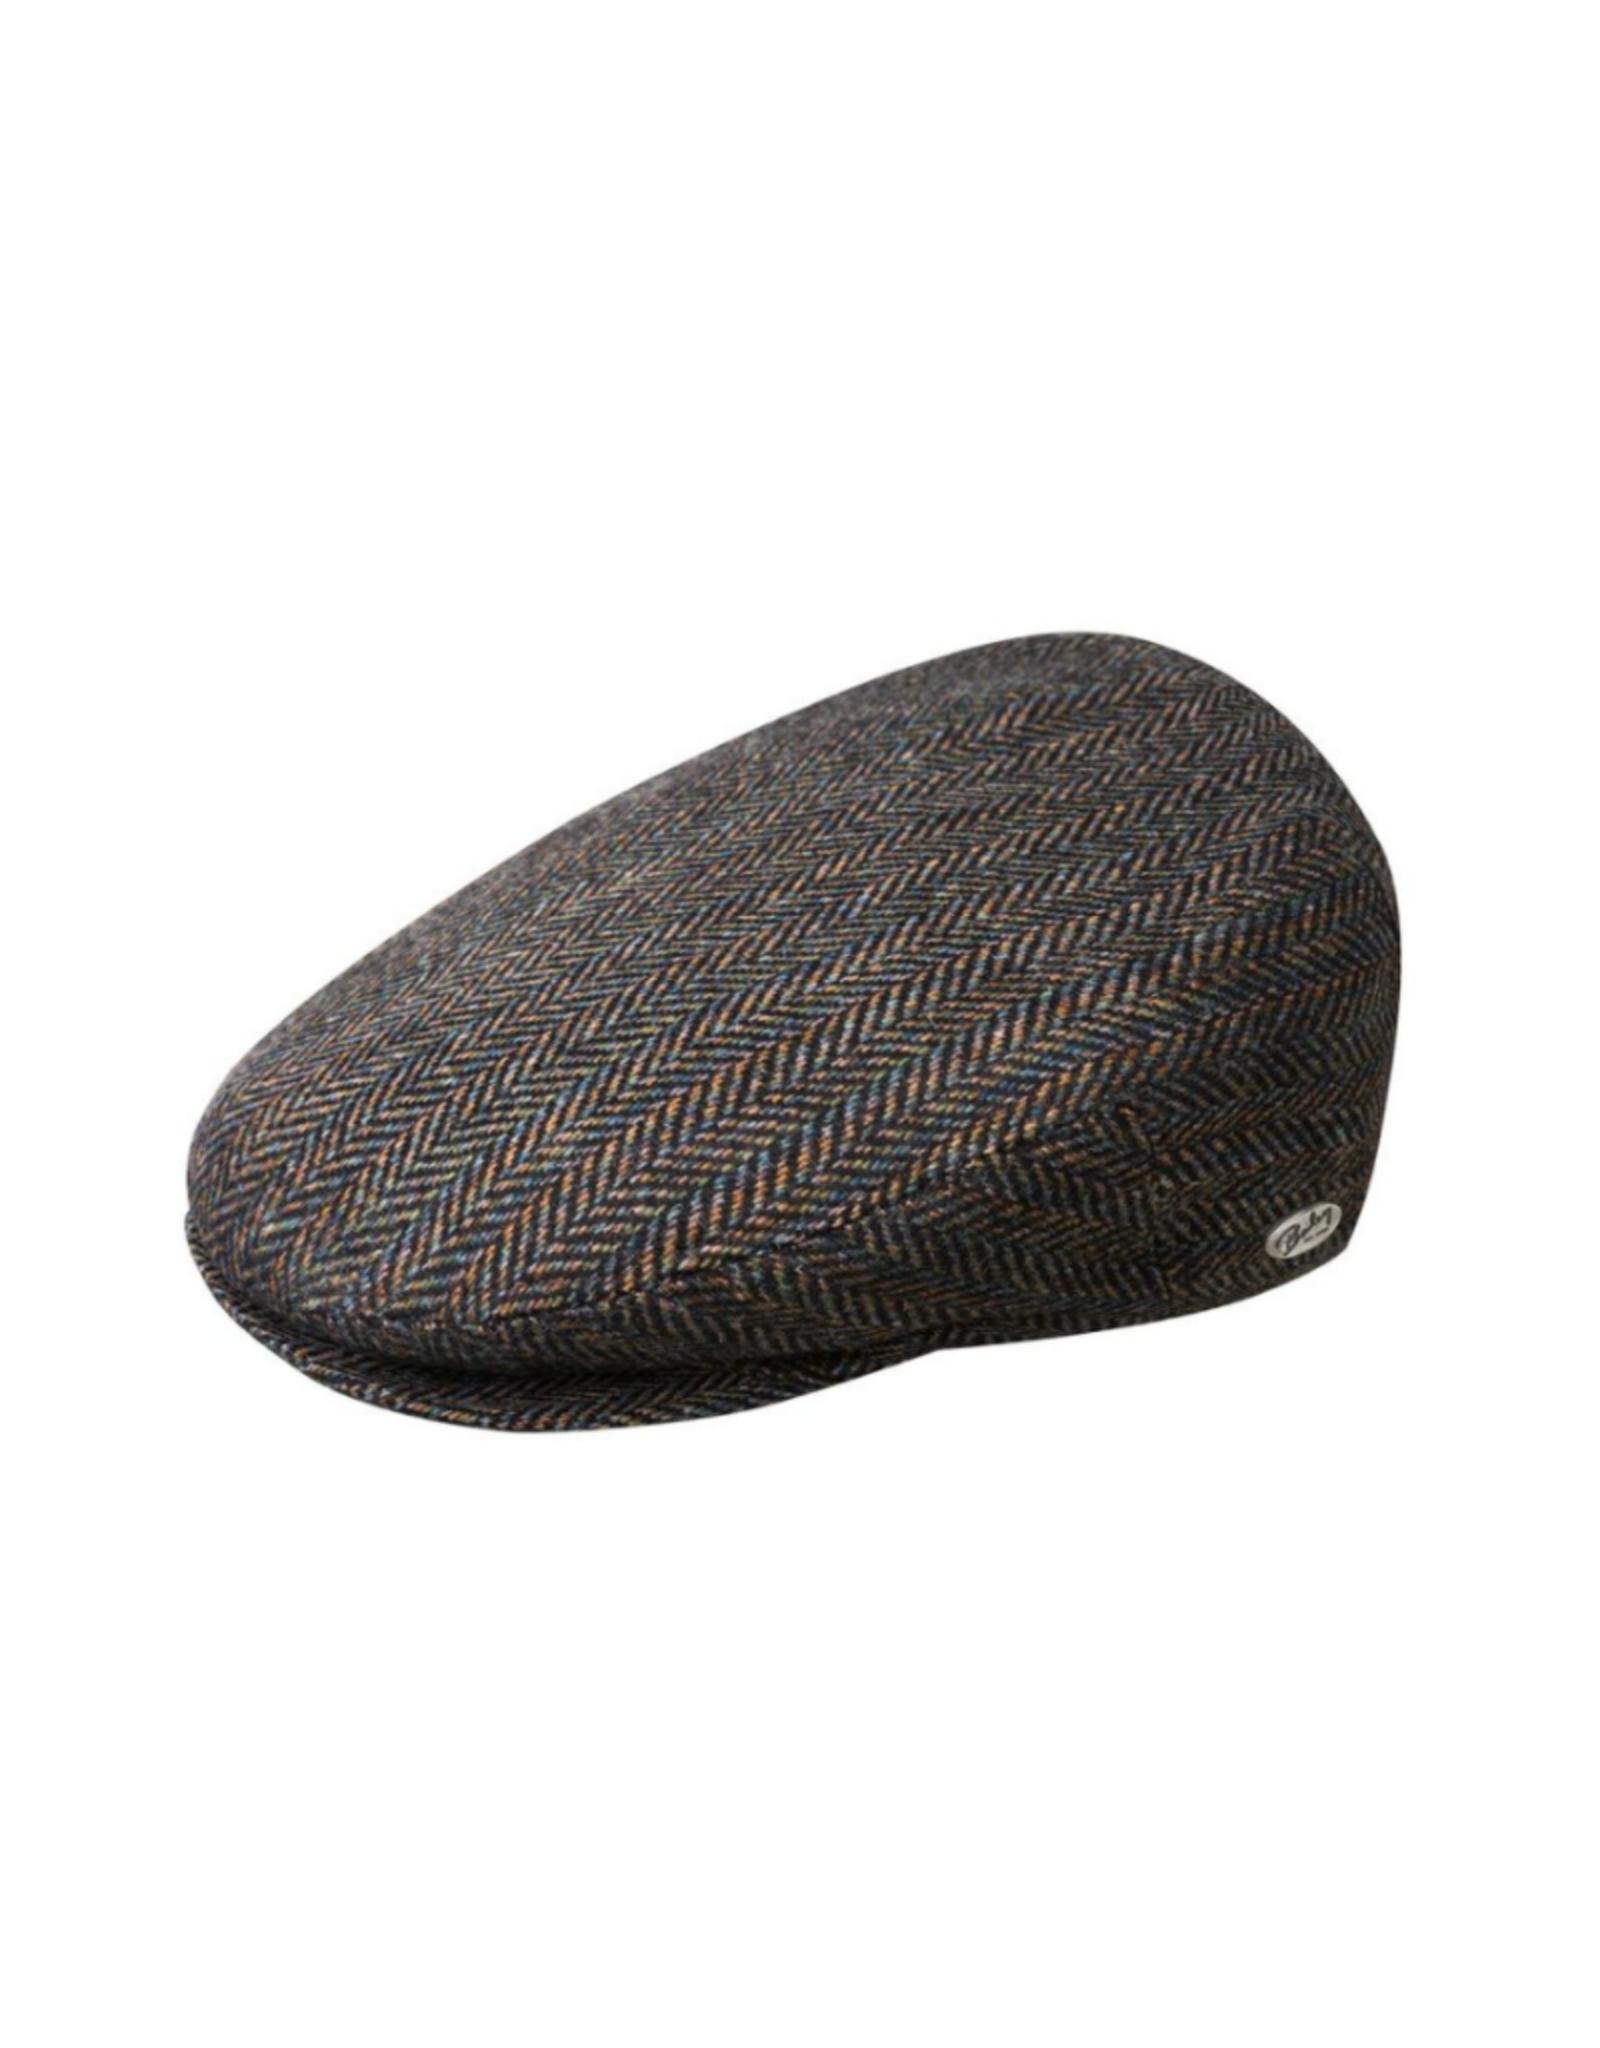 "Bailey Hat Co. HAT-IVY CAP ""LORD STRIPE HERRINGBONE"""